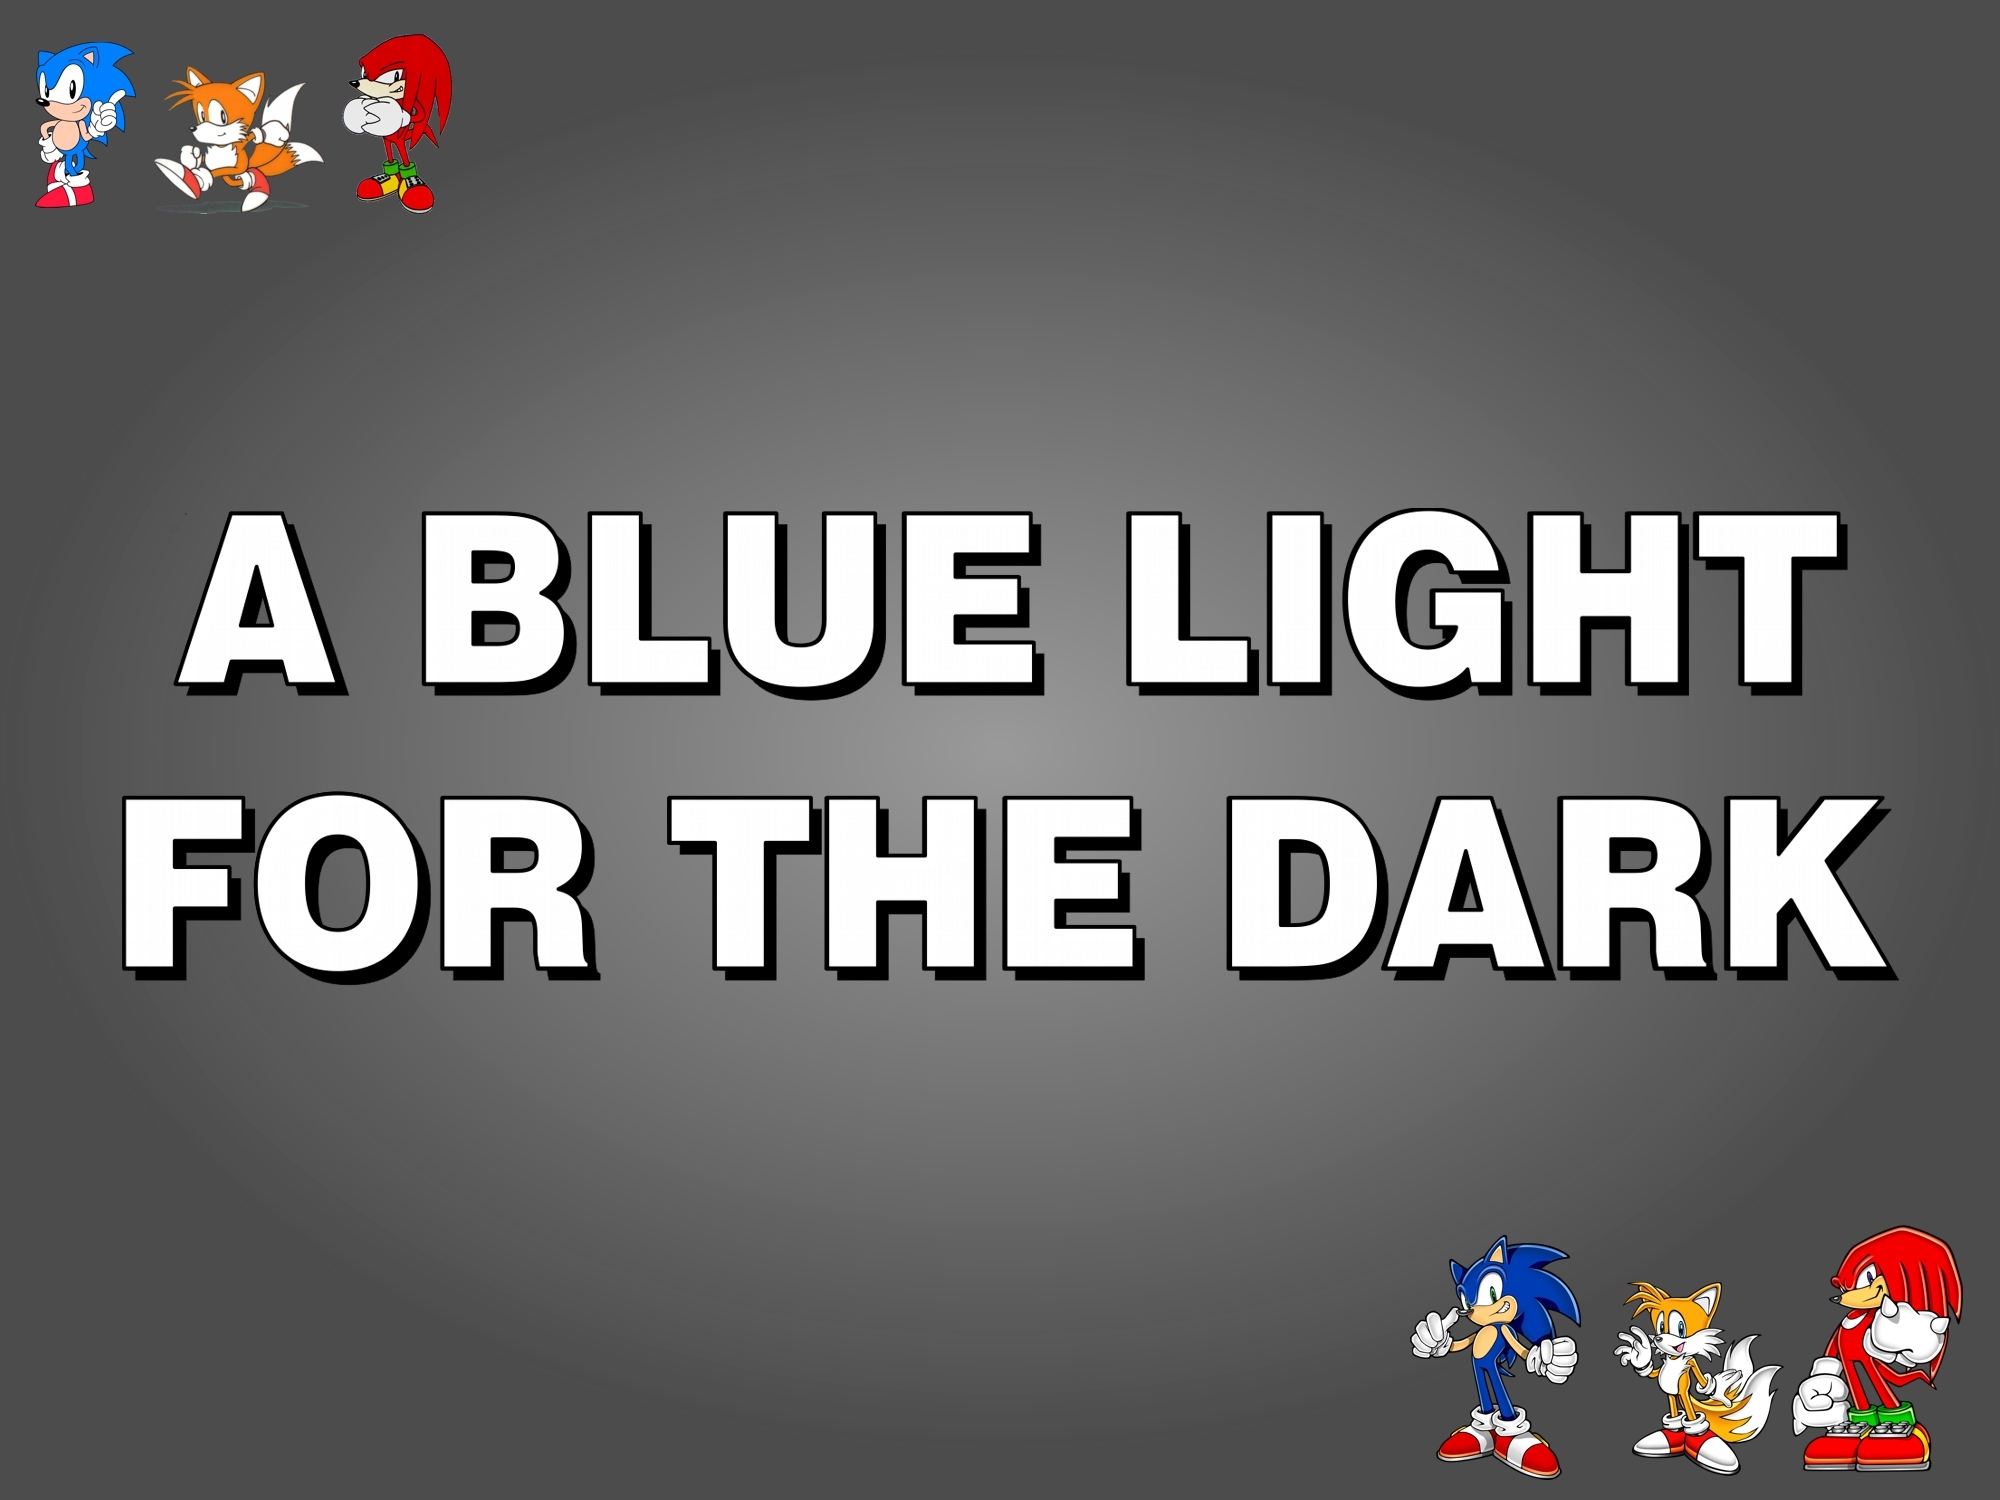 Story:A Blue Light For the Dark